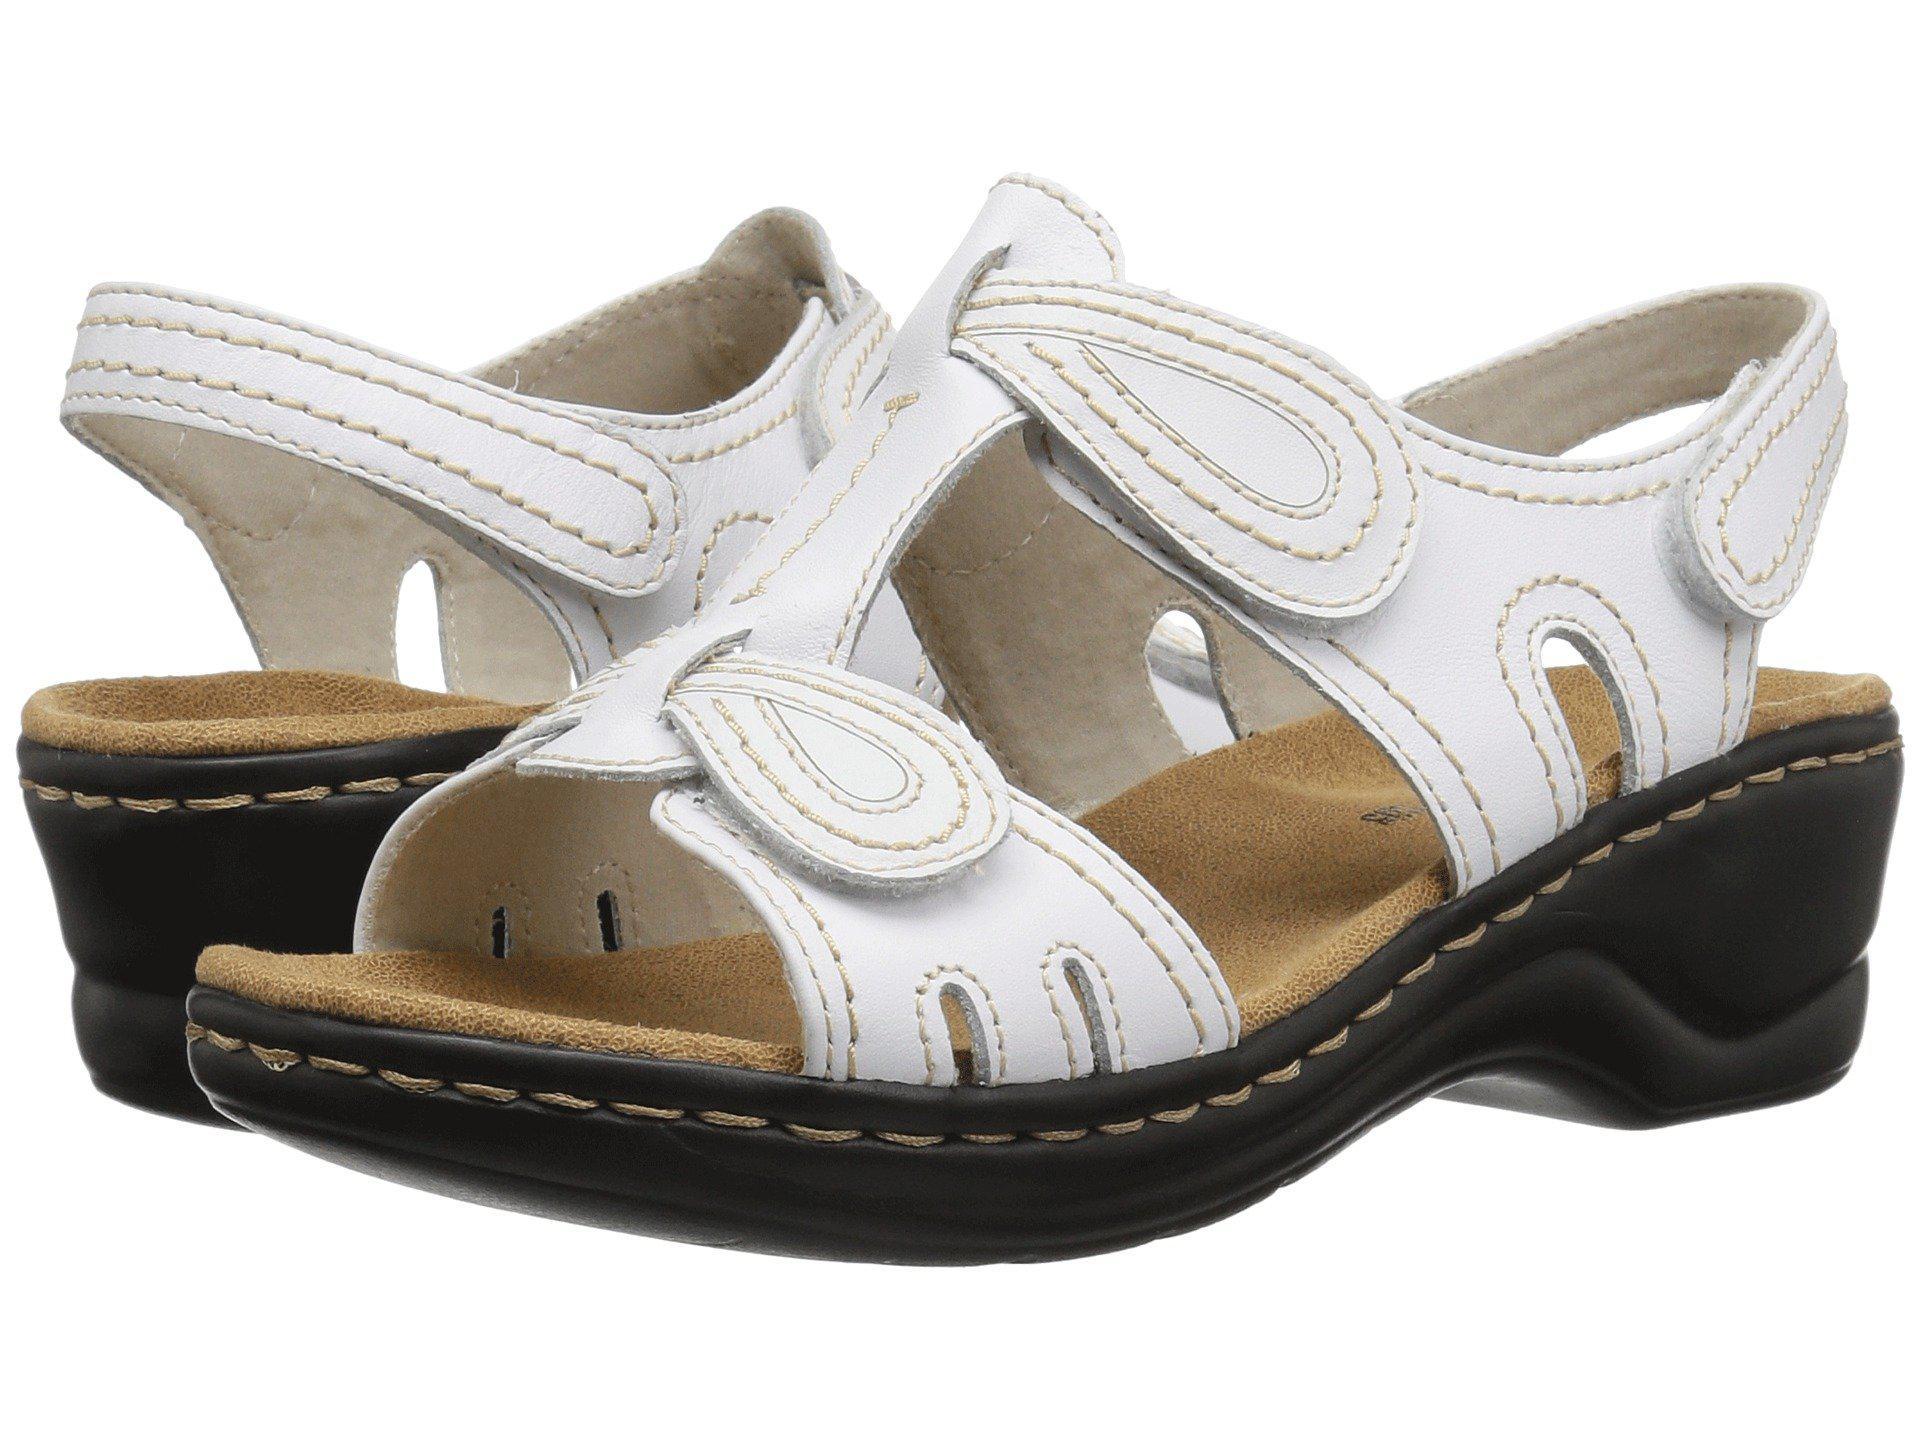 b9176b13c96929 Lyst - Clarks Lexi Walnut Q (white) Women s Sandals in White